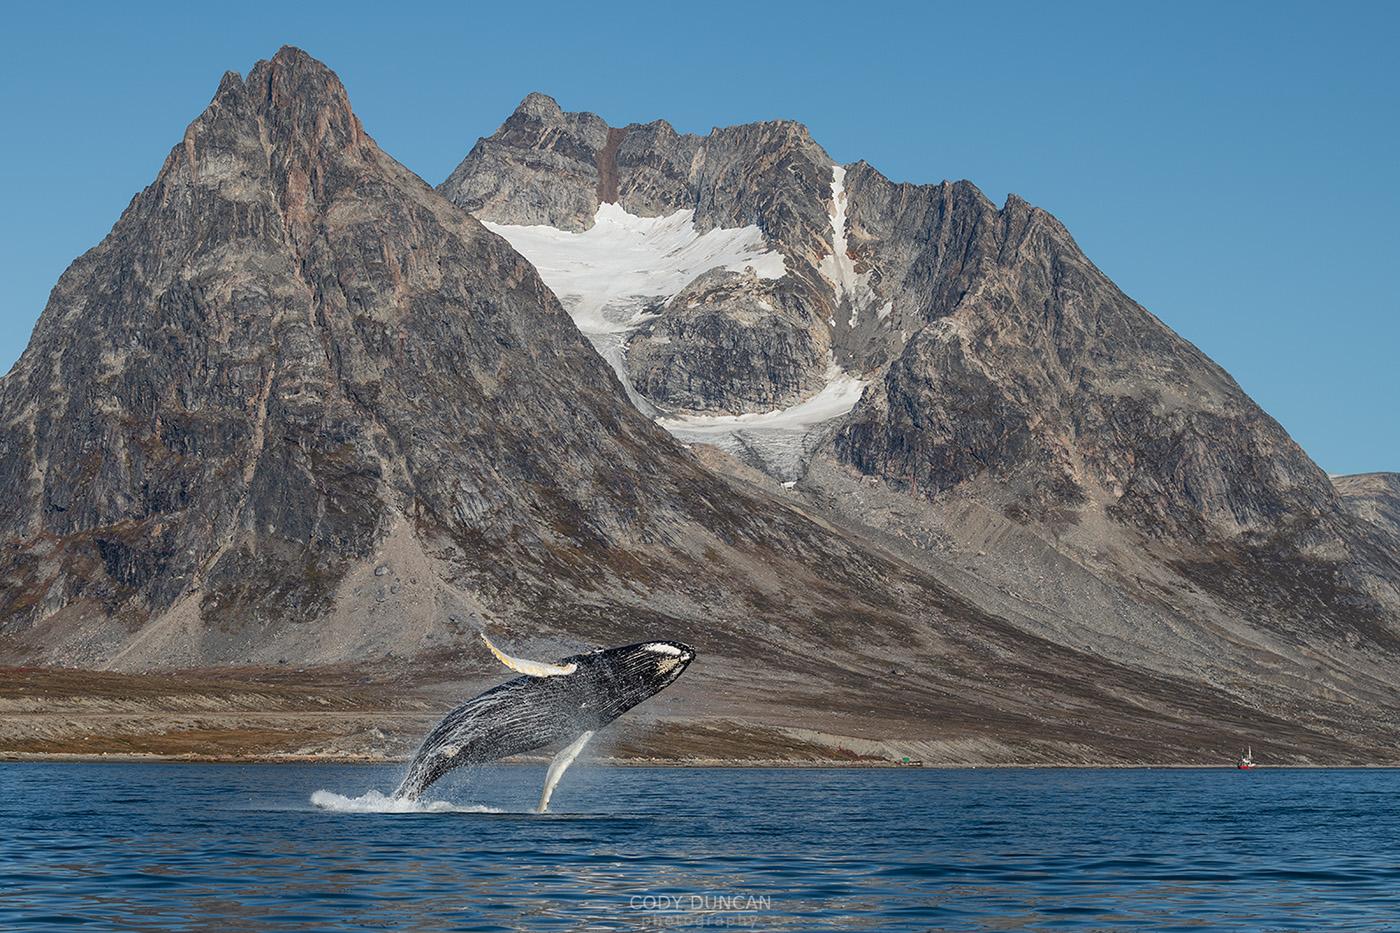 2020 East Greenland Photography Workshop